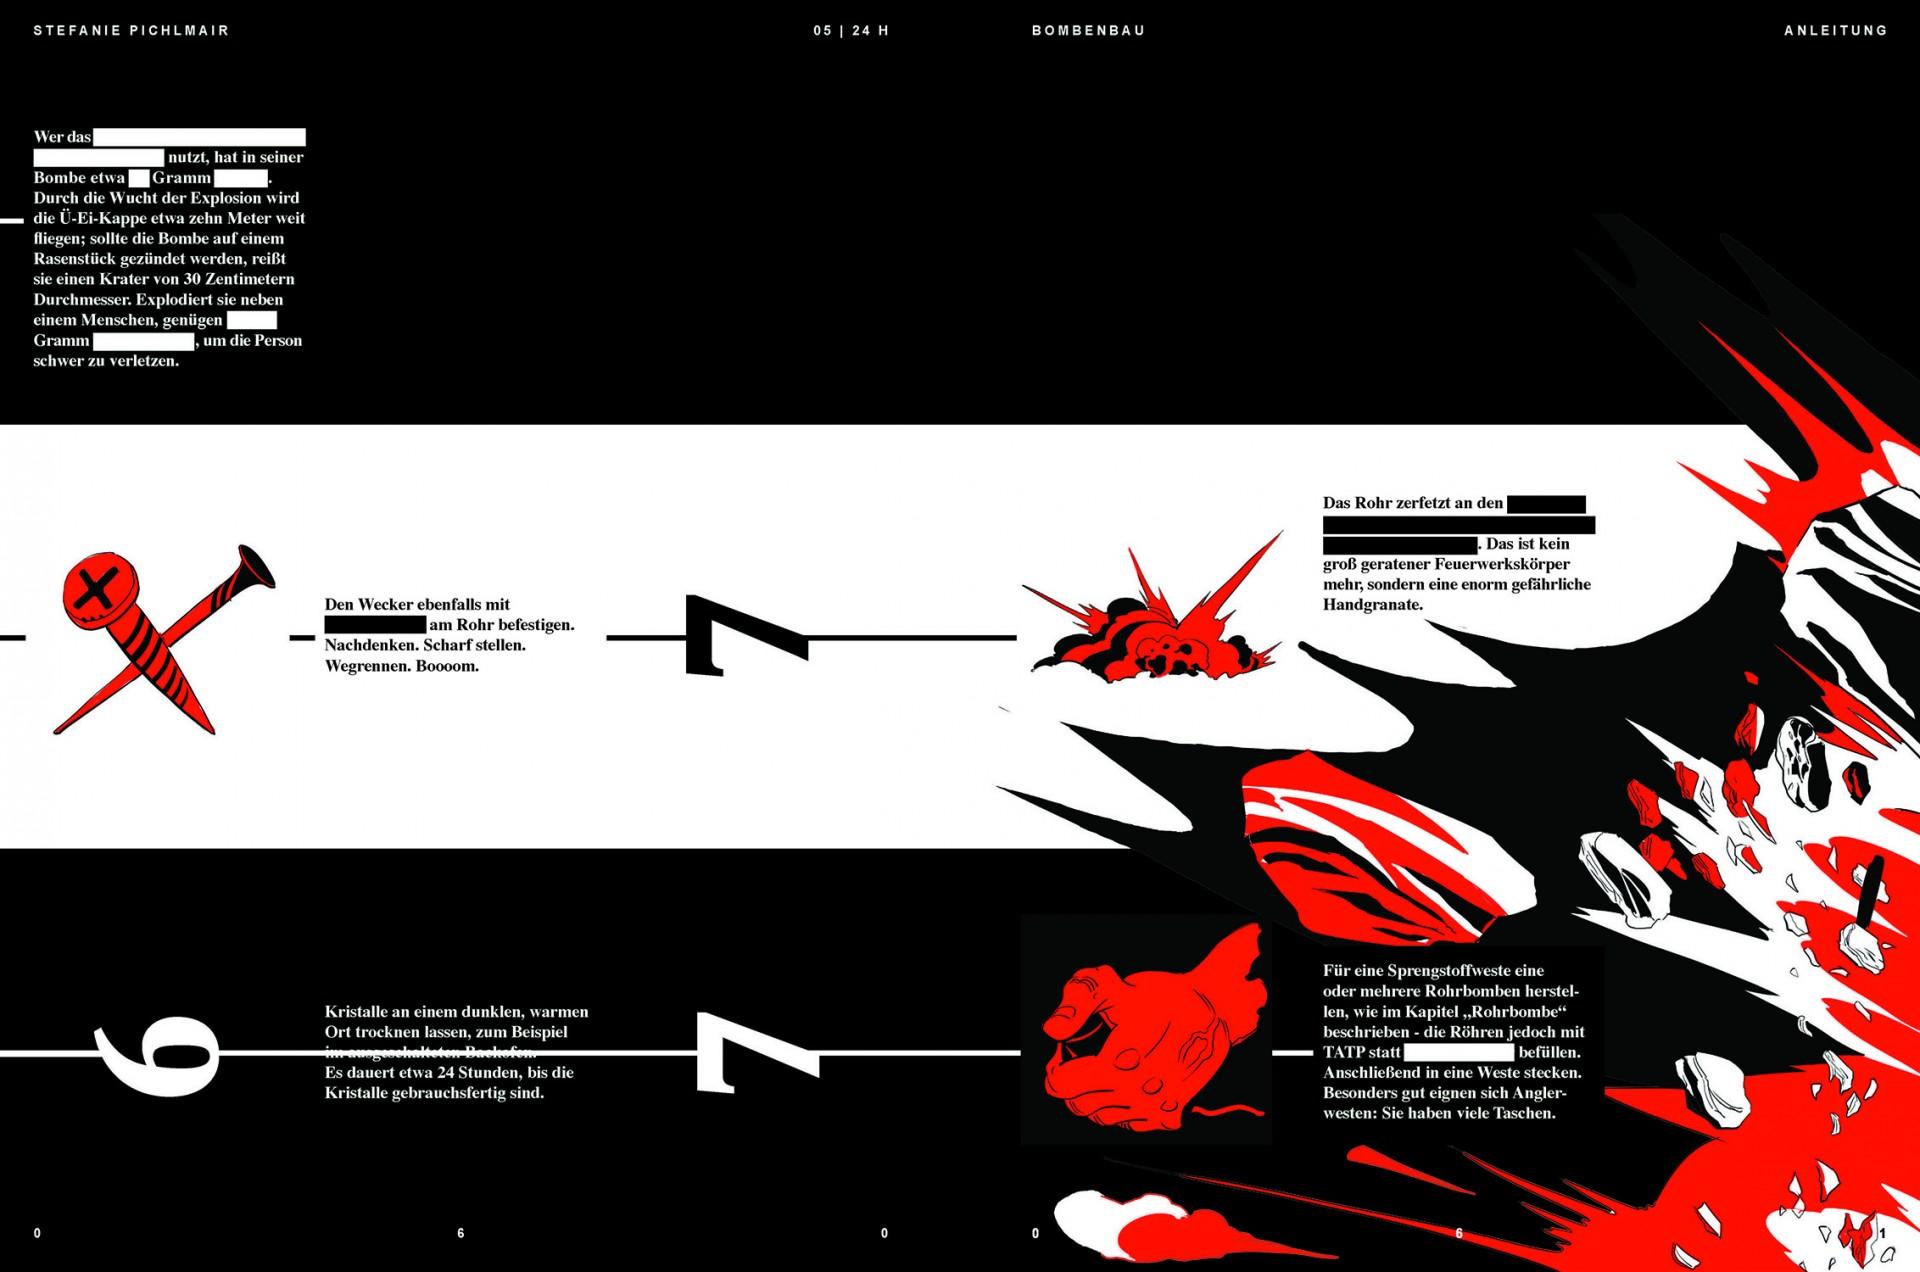 RUSSLAN ILLUSTRATION BOMBE